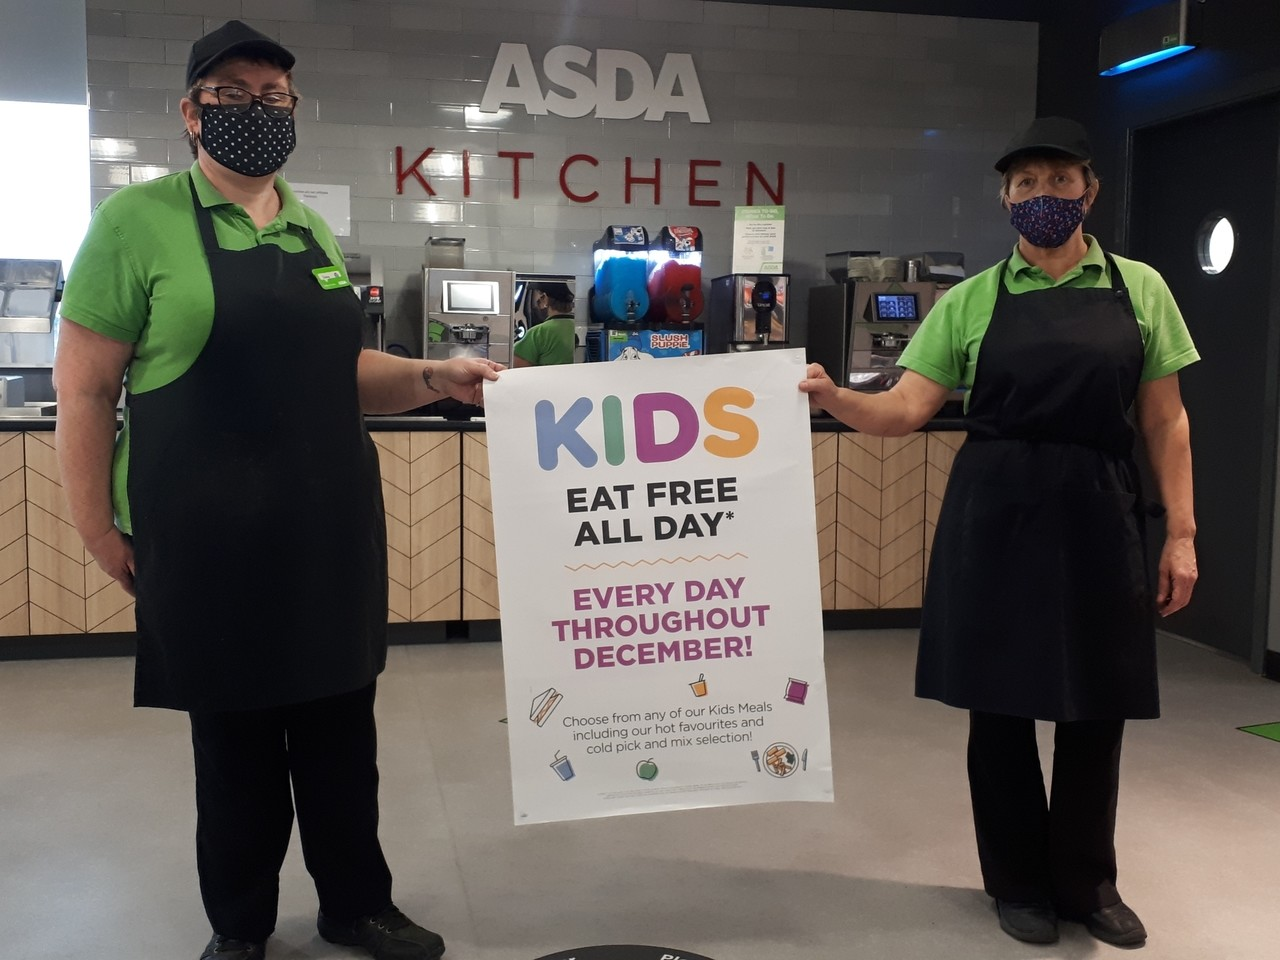 Kids eat free at our cafe | Asda Boston